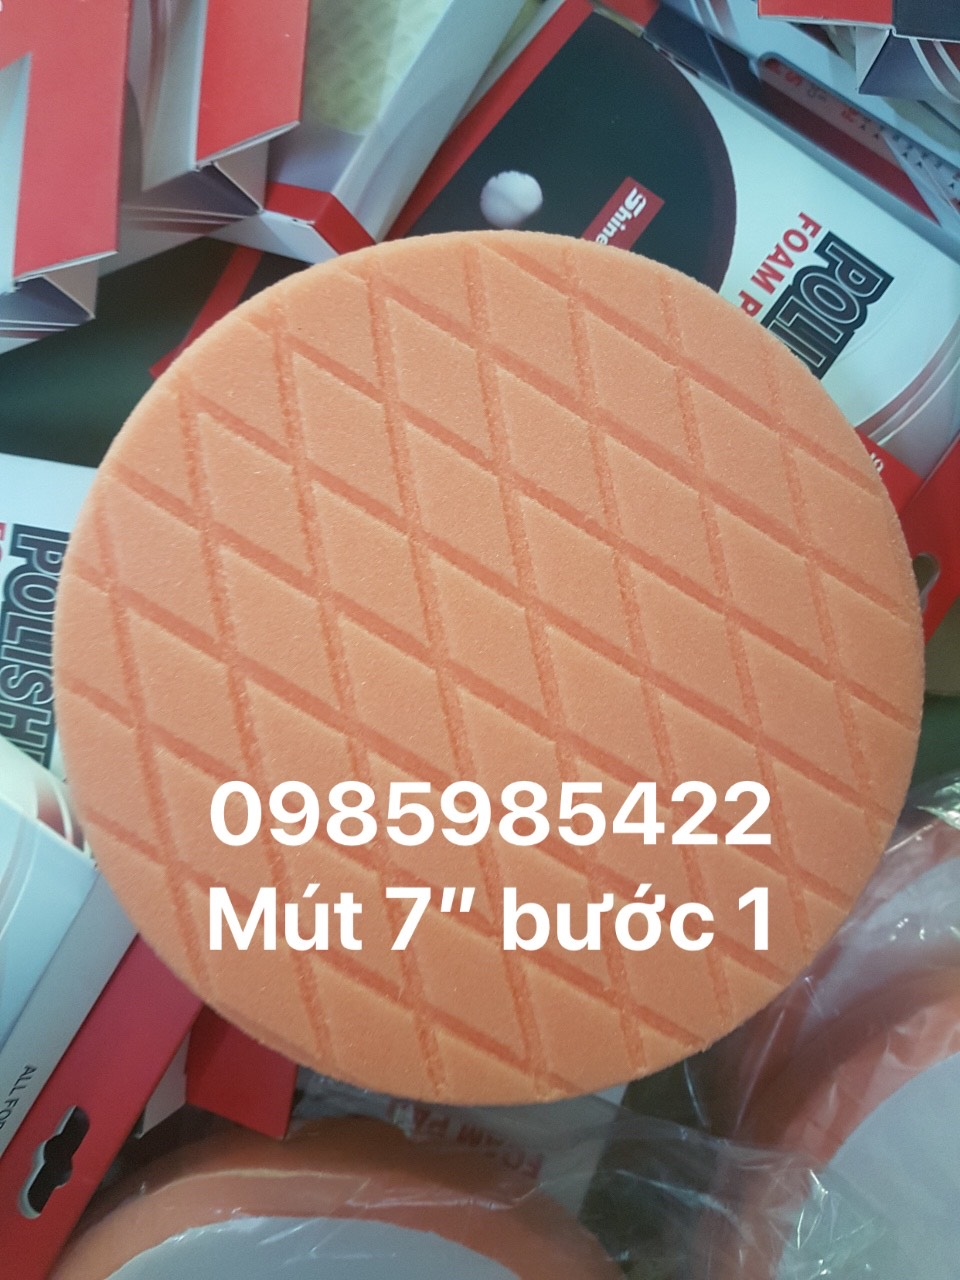 phot-mut-danh-bong-buoc-1-polishing-7inch